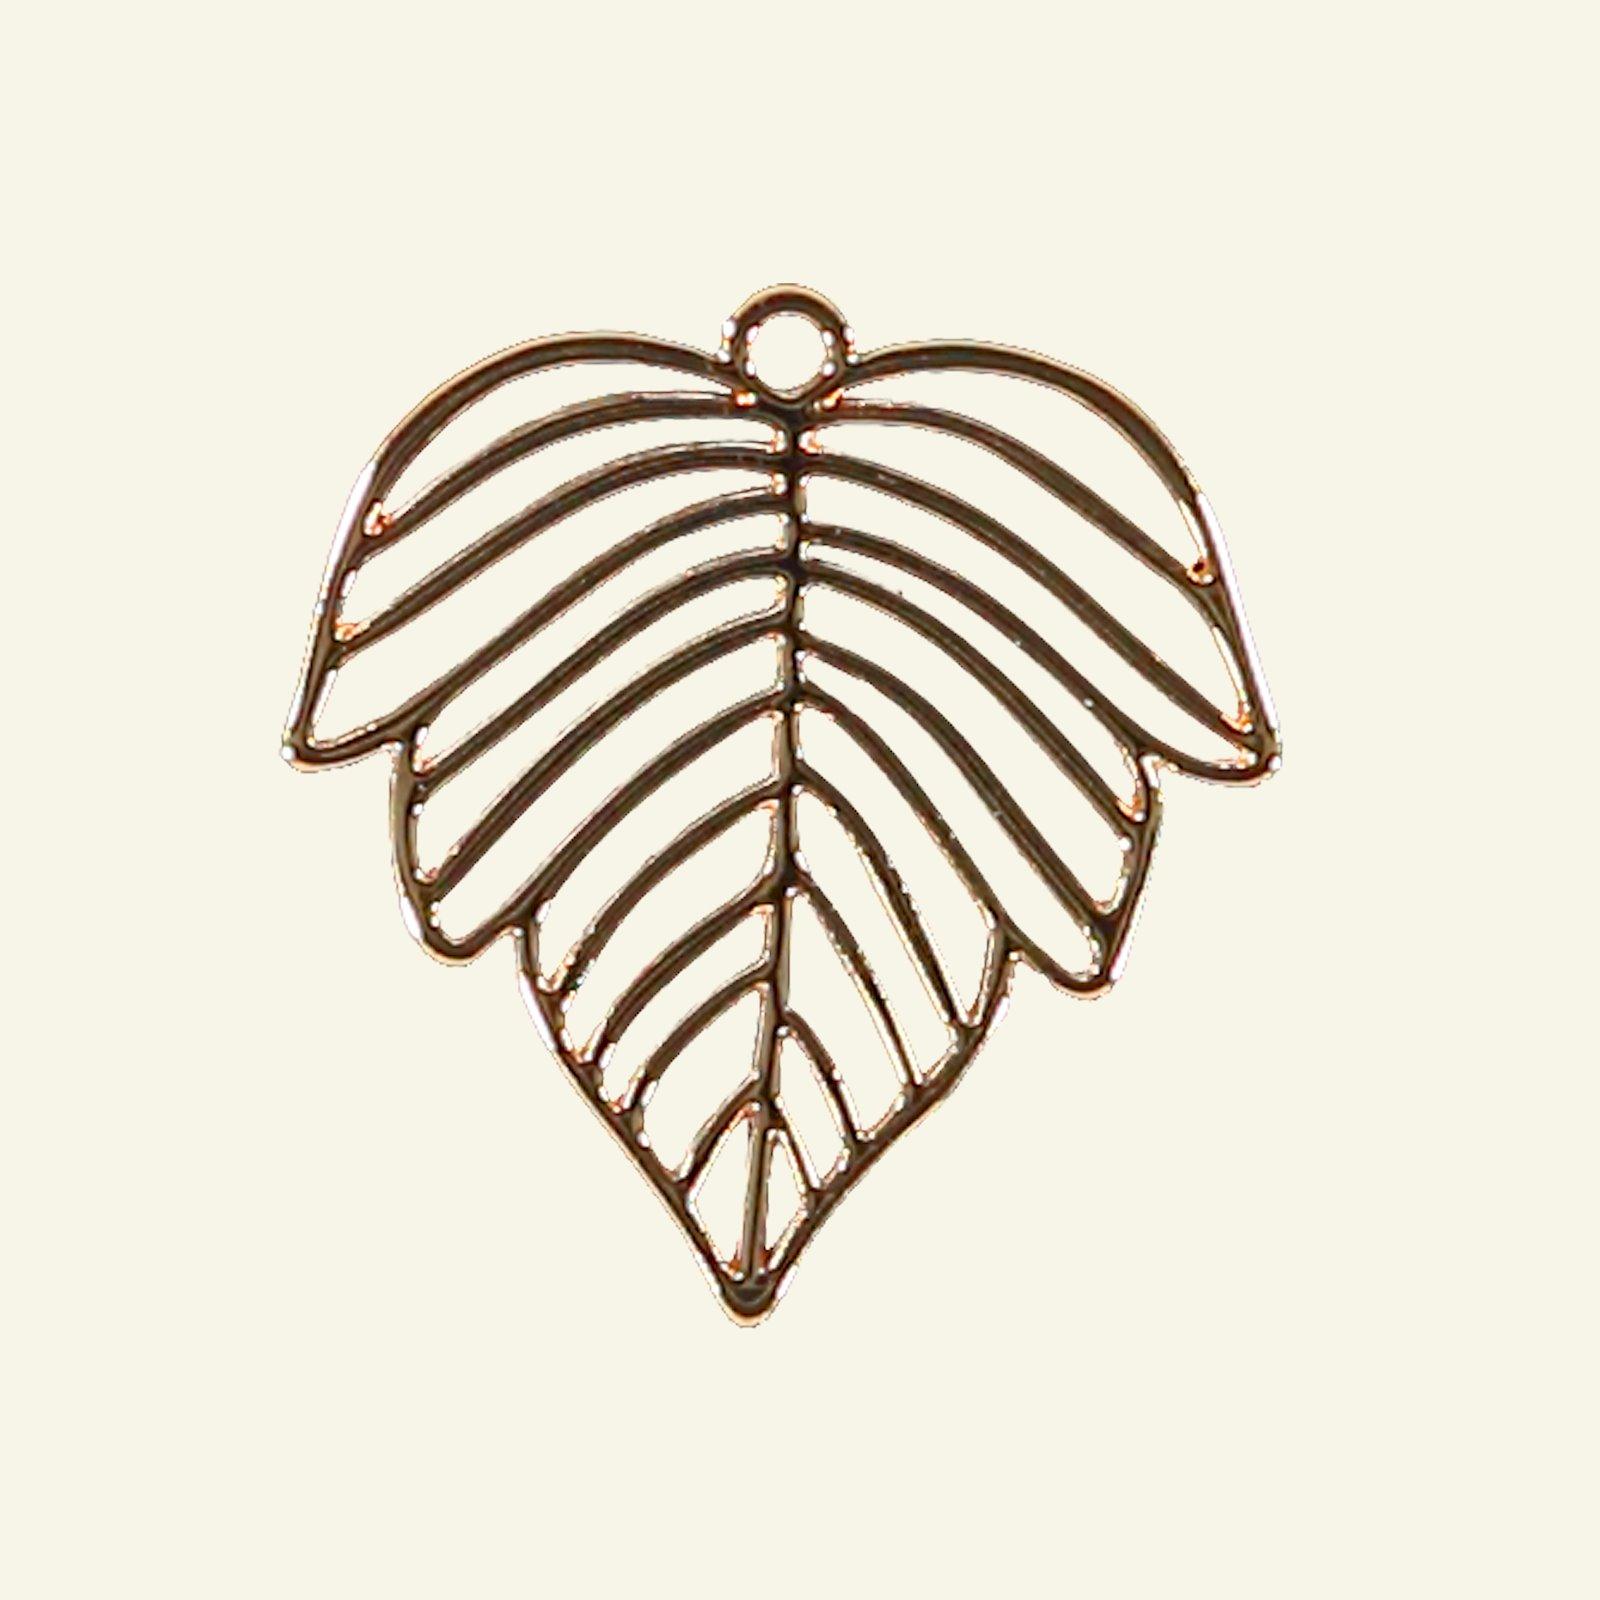 Pendant leaf 28x27mm gold 1 pc 96243_pack